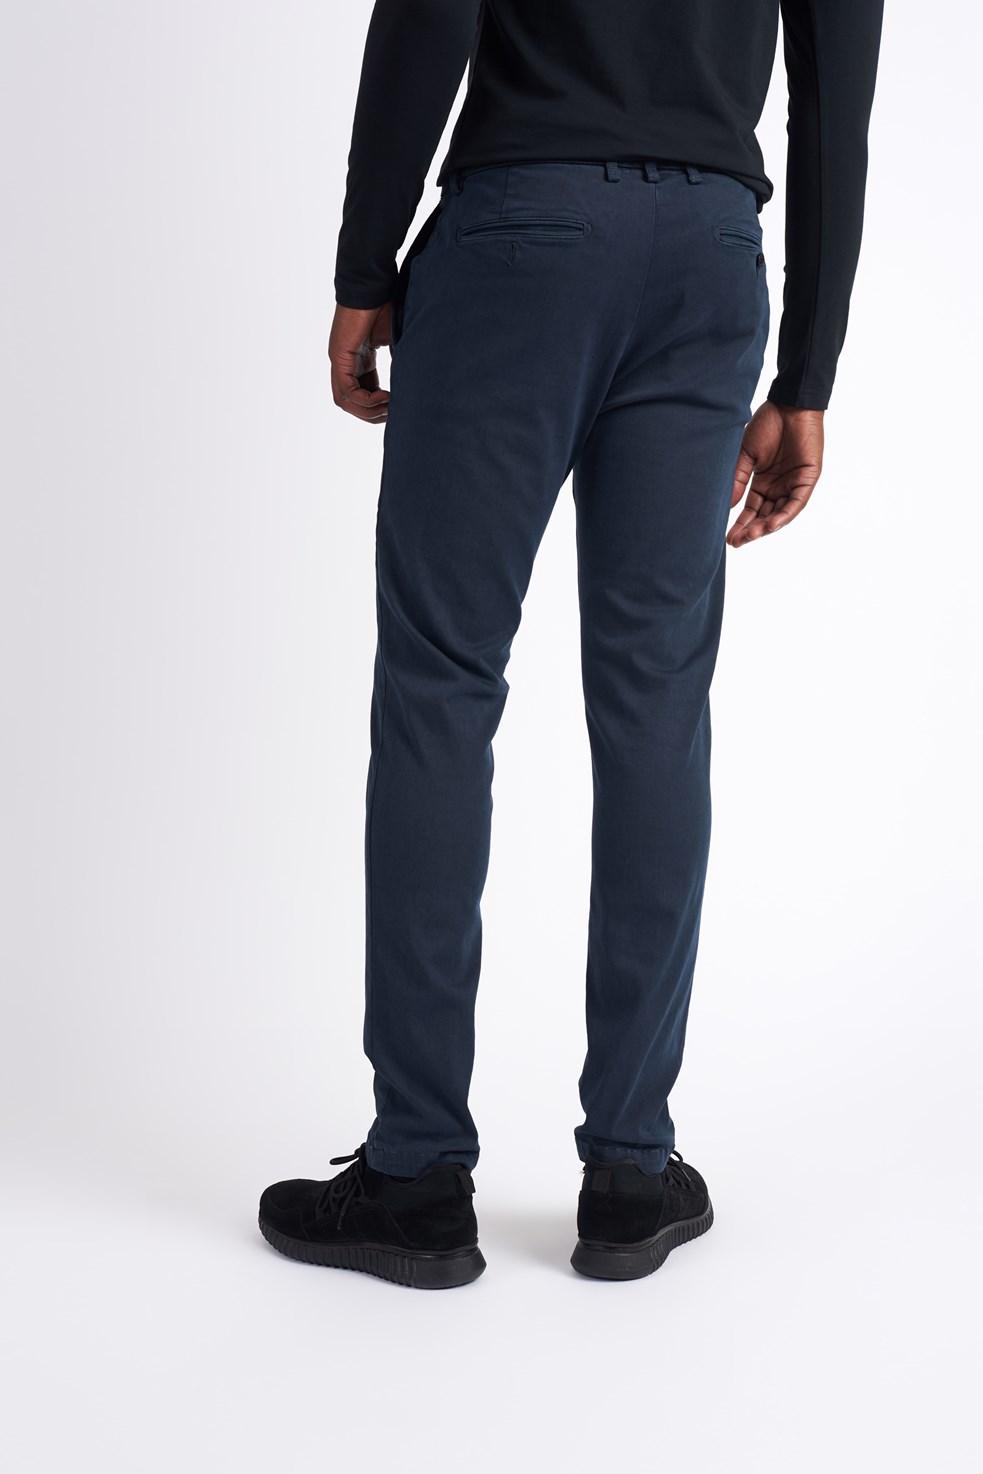 Temperament Schuhe harmonische Farben neueste trends Replay Chino Hyperflex Zeumar 197 Blue - MQ